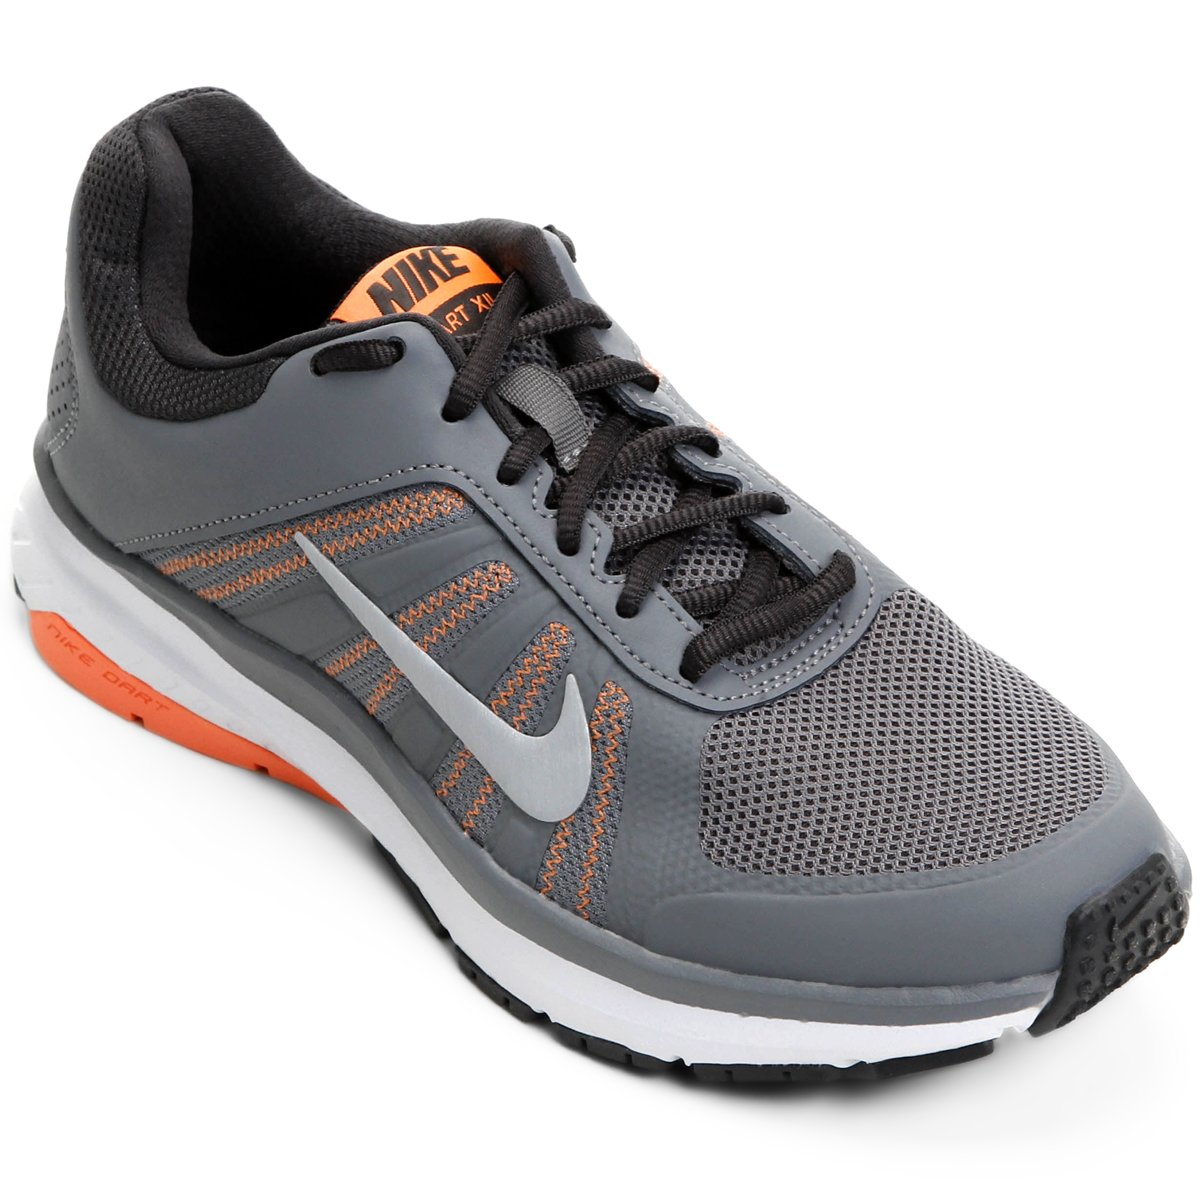 8ff9b109c0 Tênis Nike Dart 12 MSL Feminino